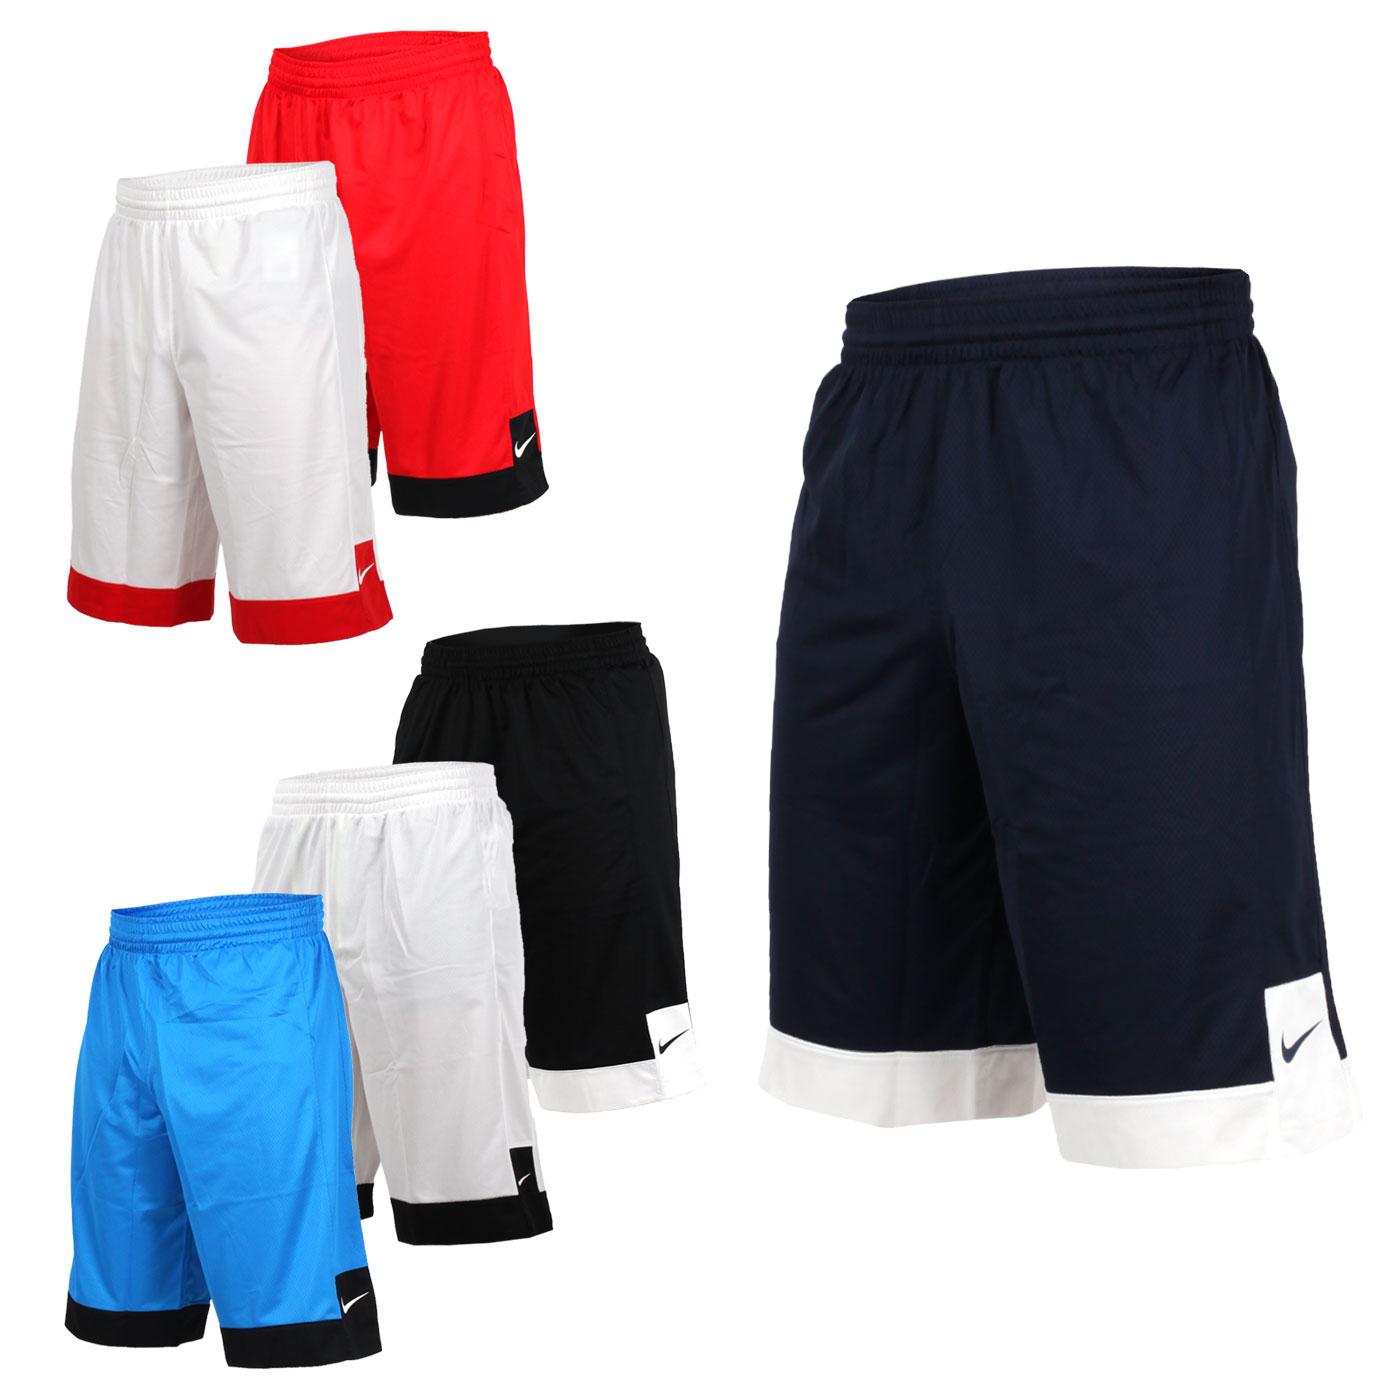 NIKE 男針織短褲 (路跑 慢跑 籃球褲【04351183】≡排汗專家≡